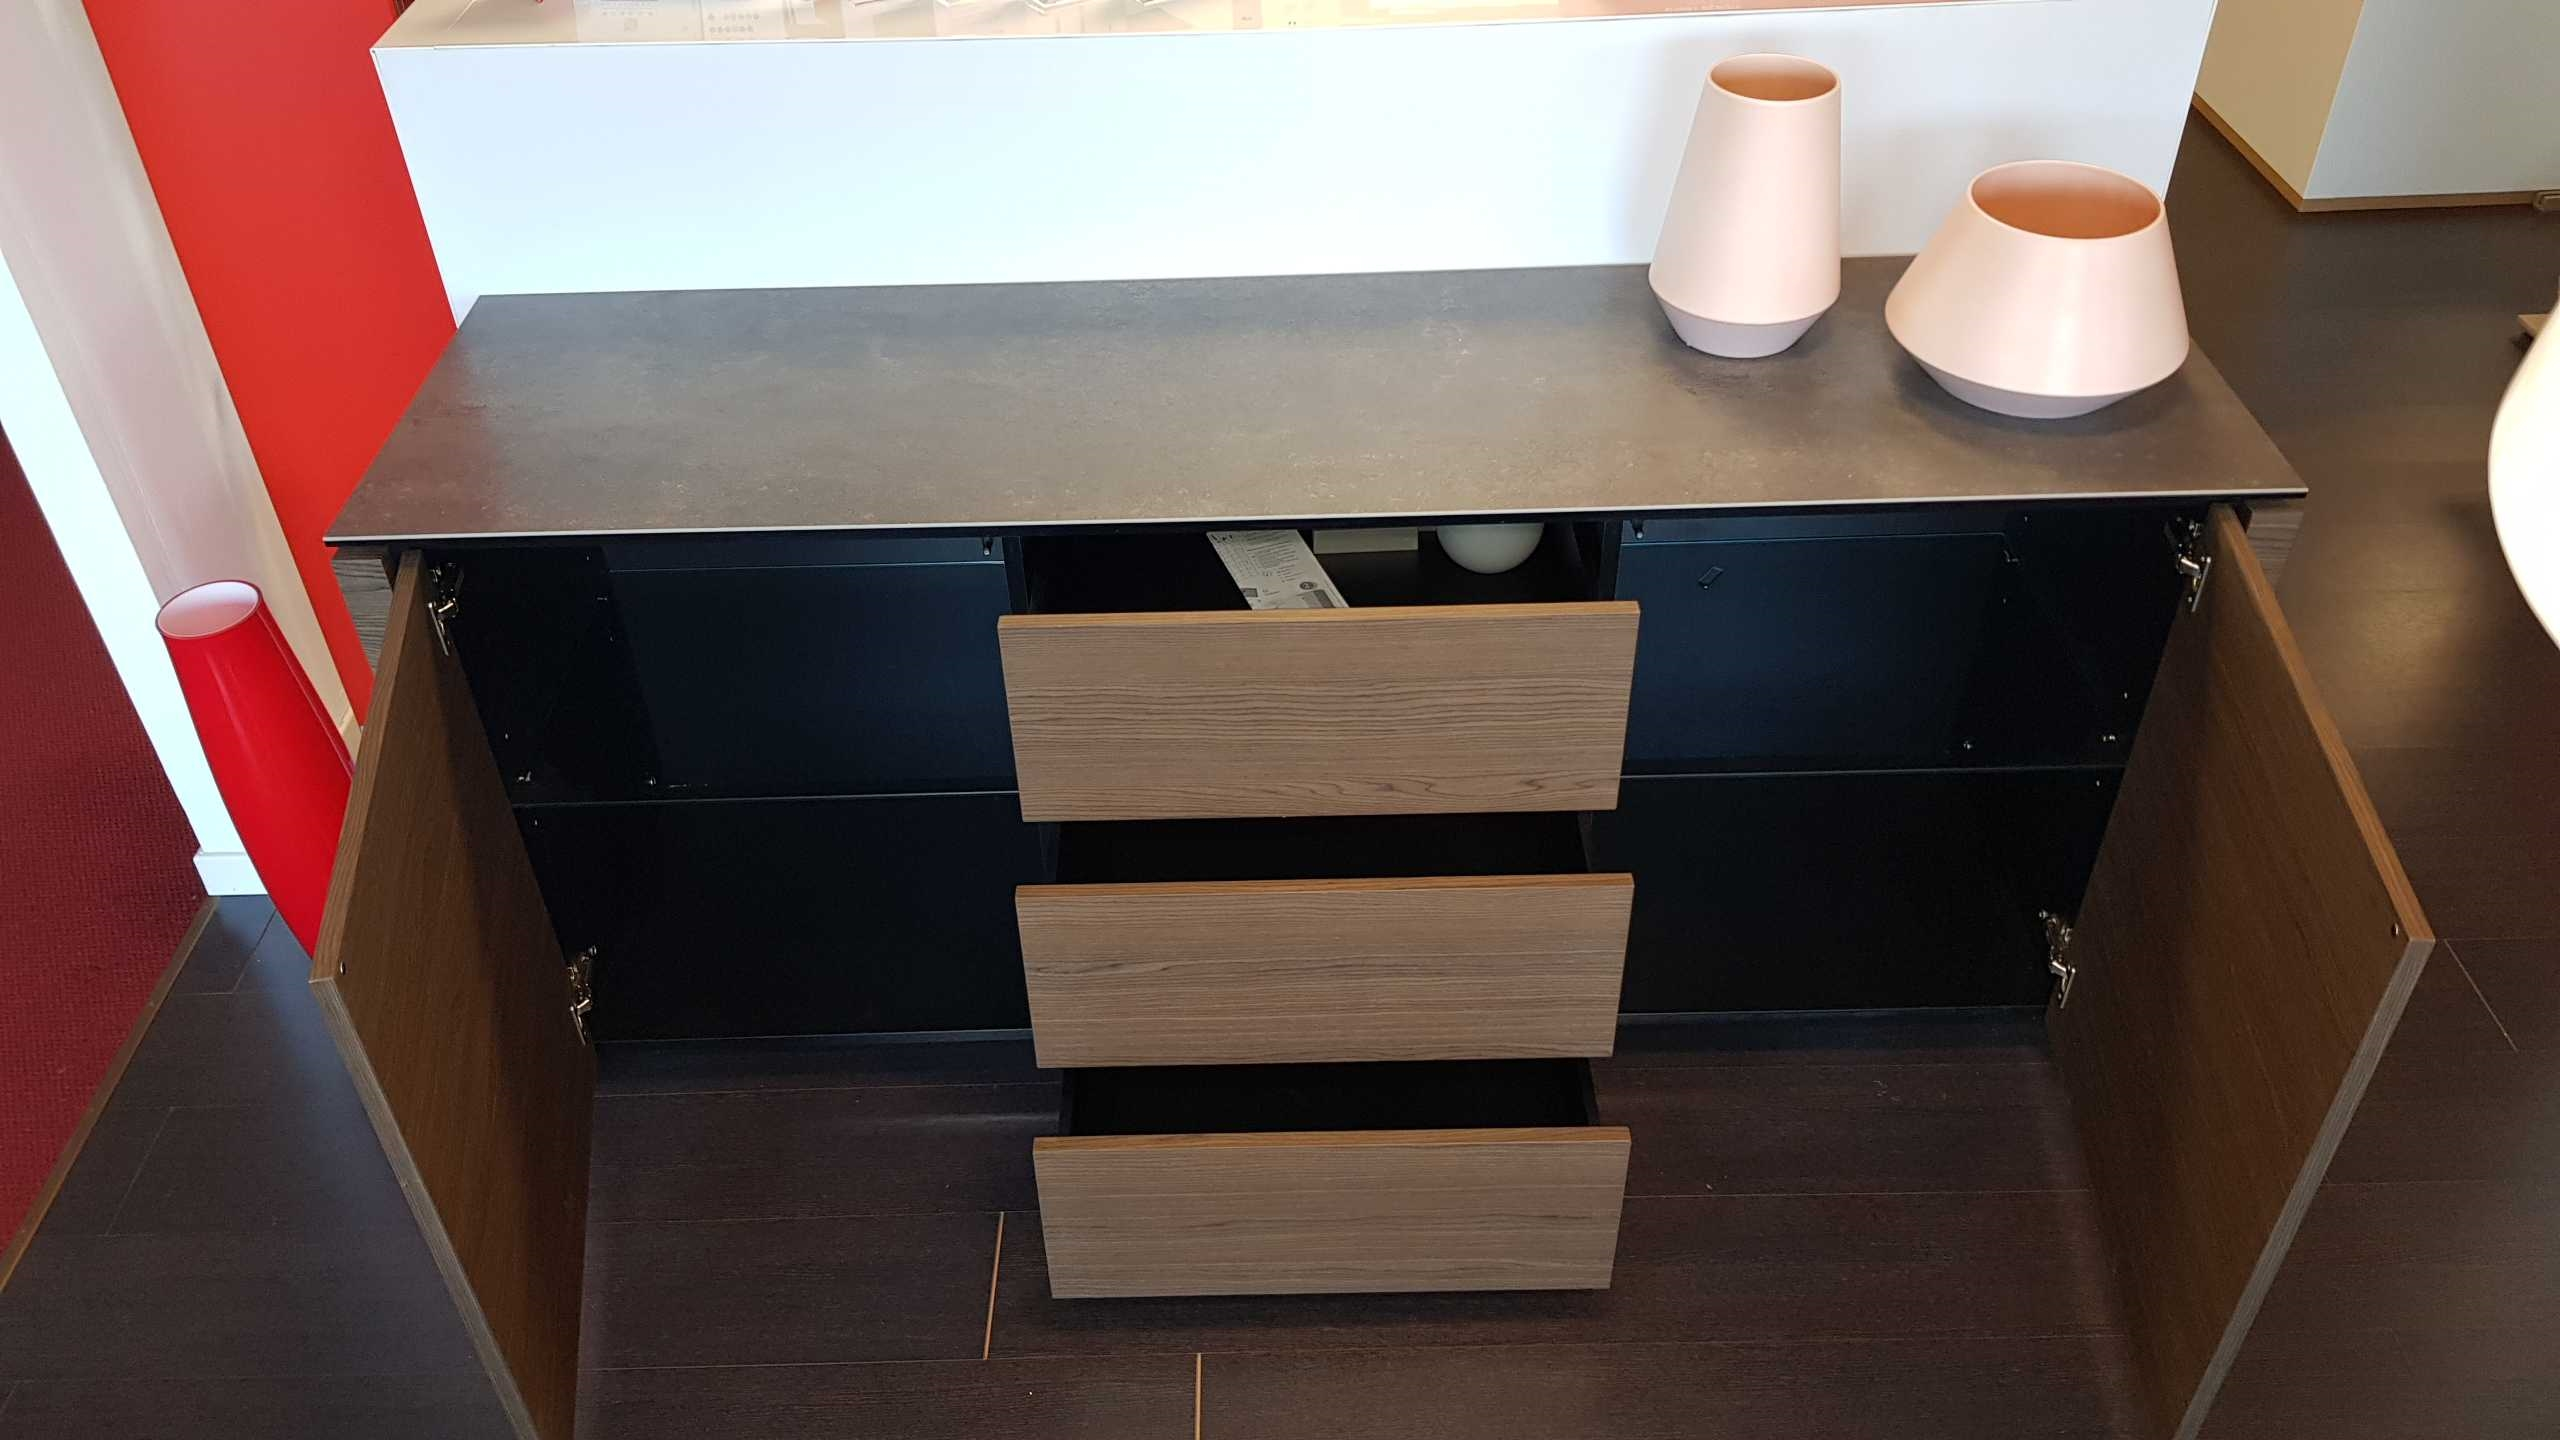 Outlet madia calligaris mag con piano in ceramica for Calligaris mobili soggiorno